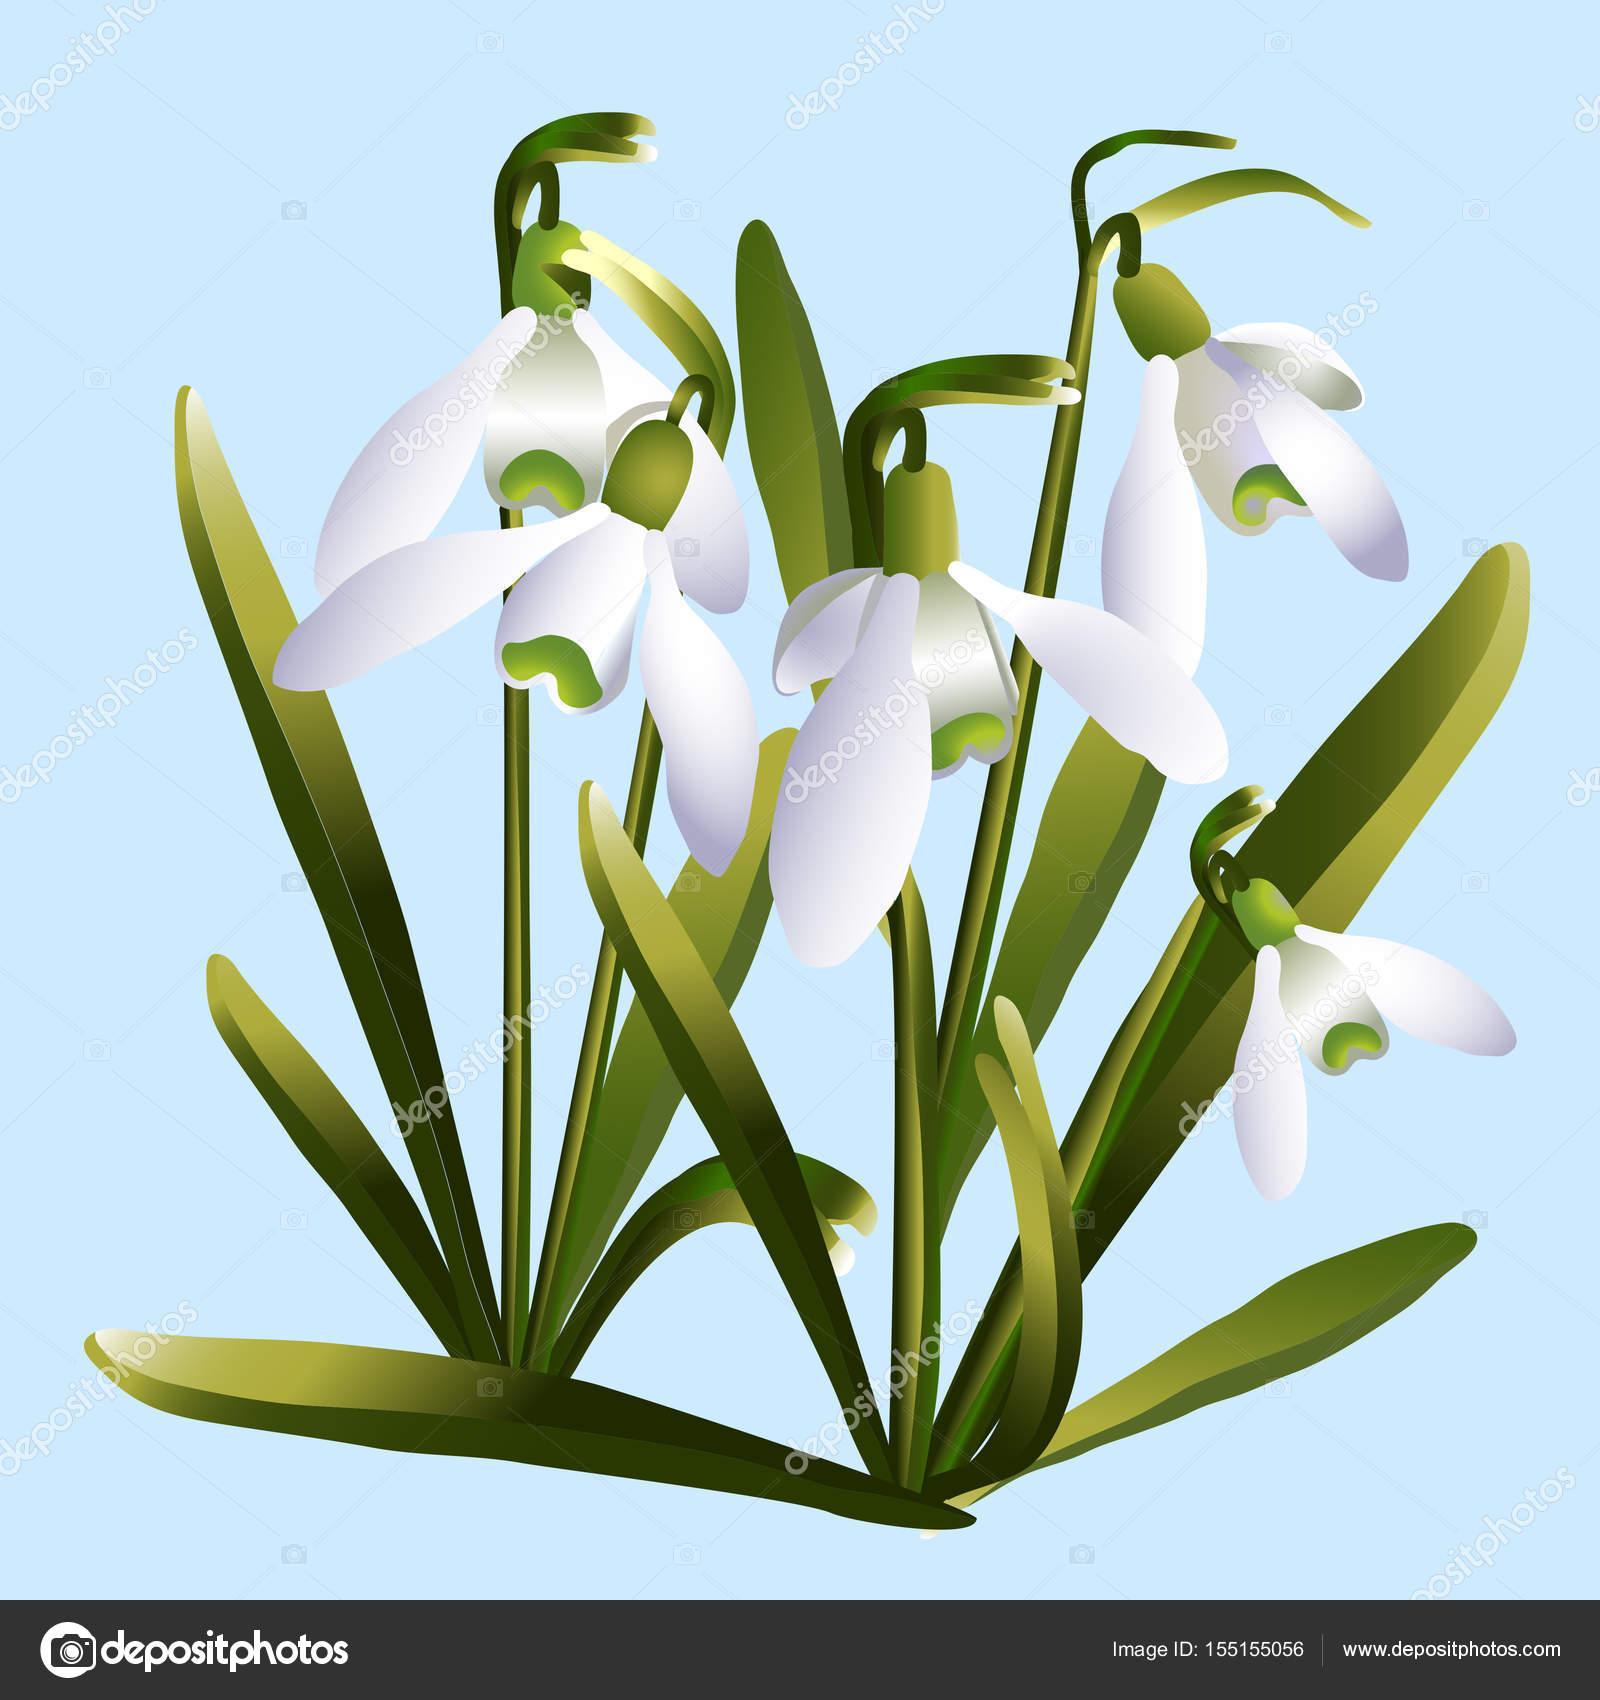 Fleurs Perce Neige Galantus Image Vectorielle Juliastud C 155155056